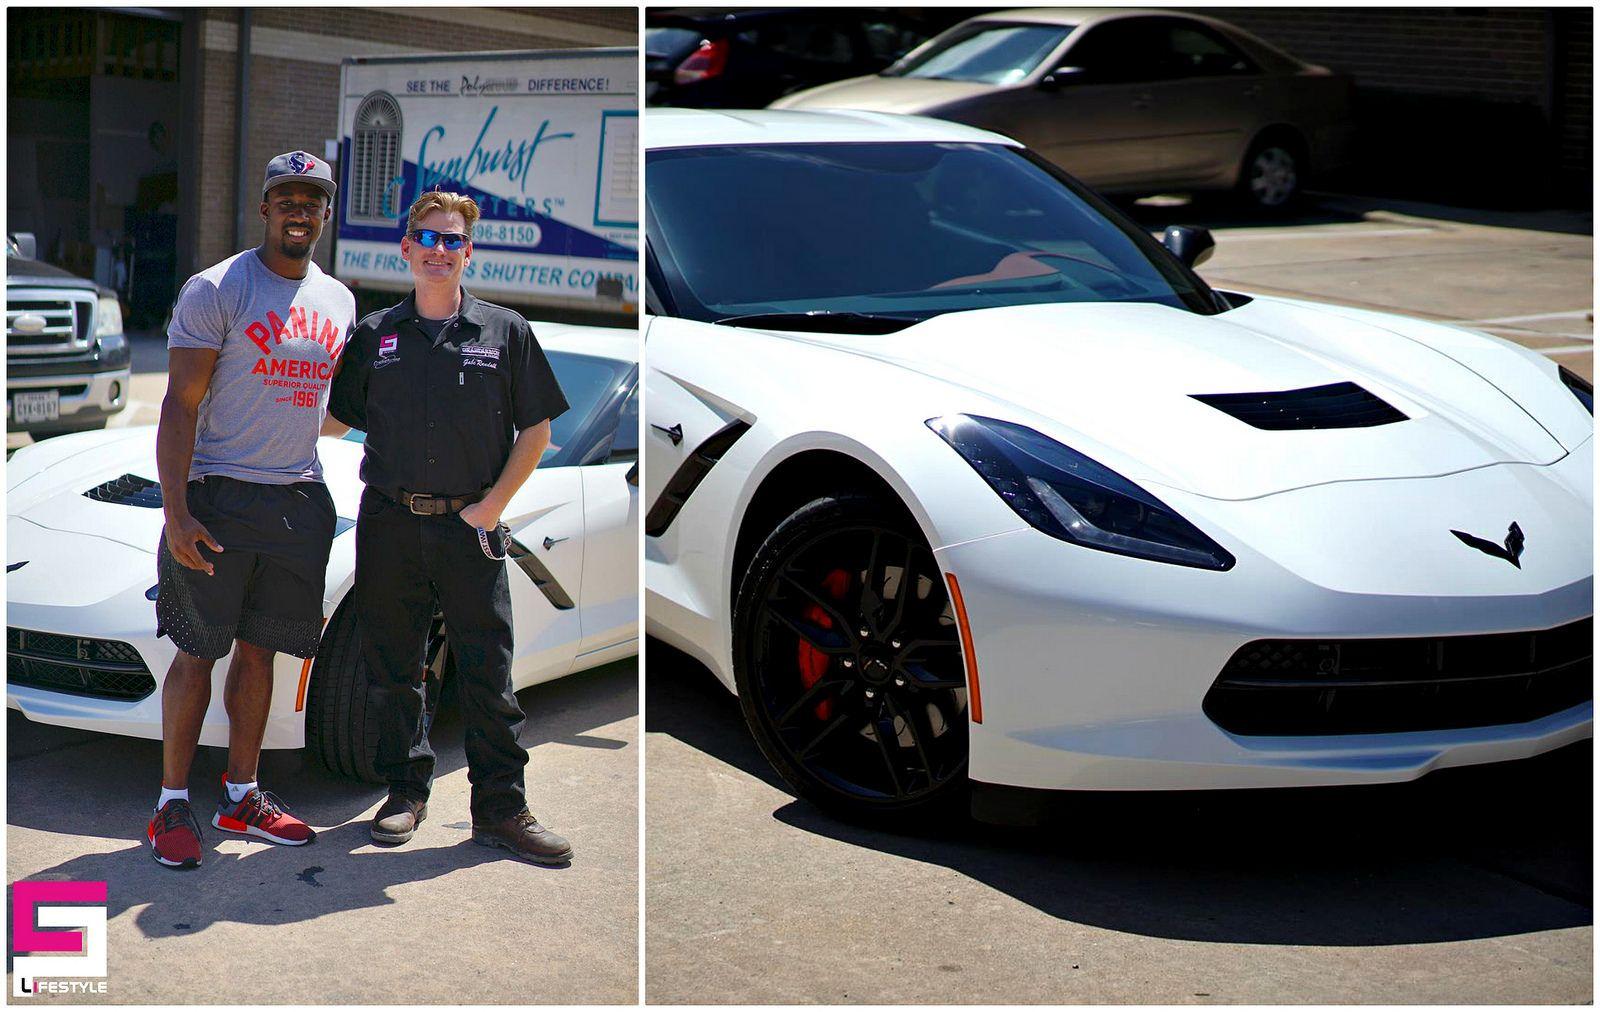 Houstontexans S Star Tyler Ervin Got His Corvette Protected With Ceramic Pro By Ceramic Pro Texas Ceramicprousa Corvette S Star Stars